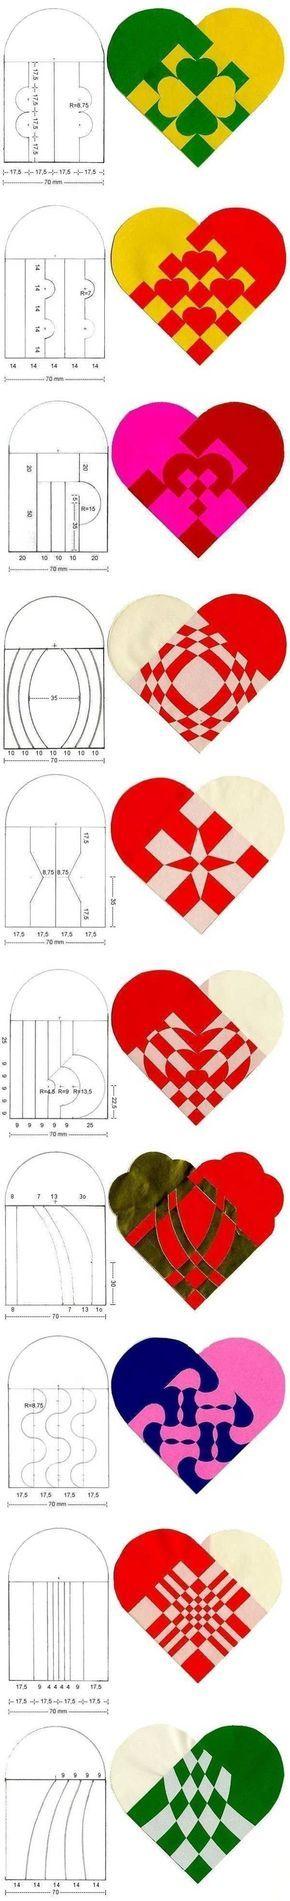 DIY Heart Patterns                                                       …